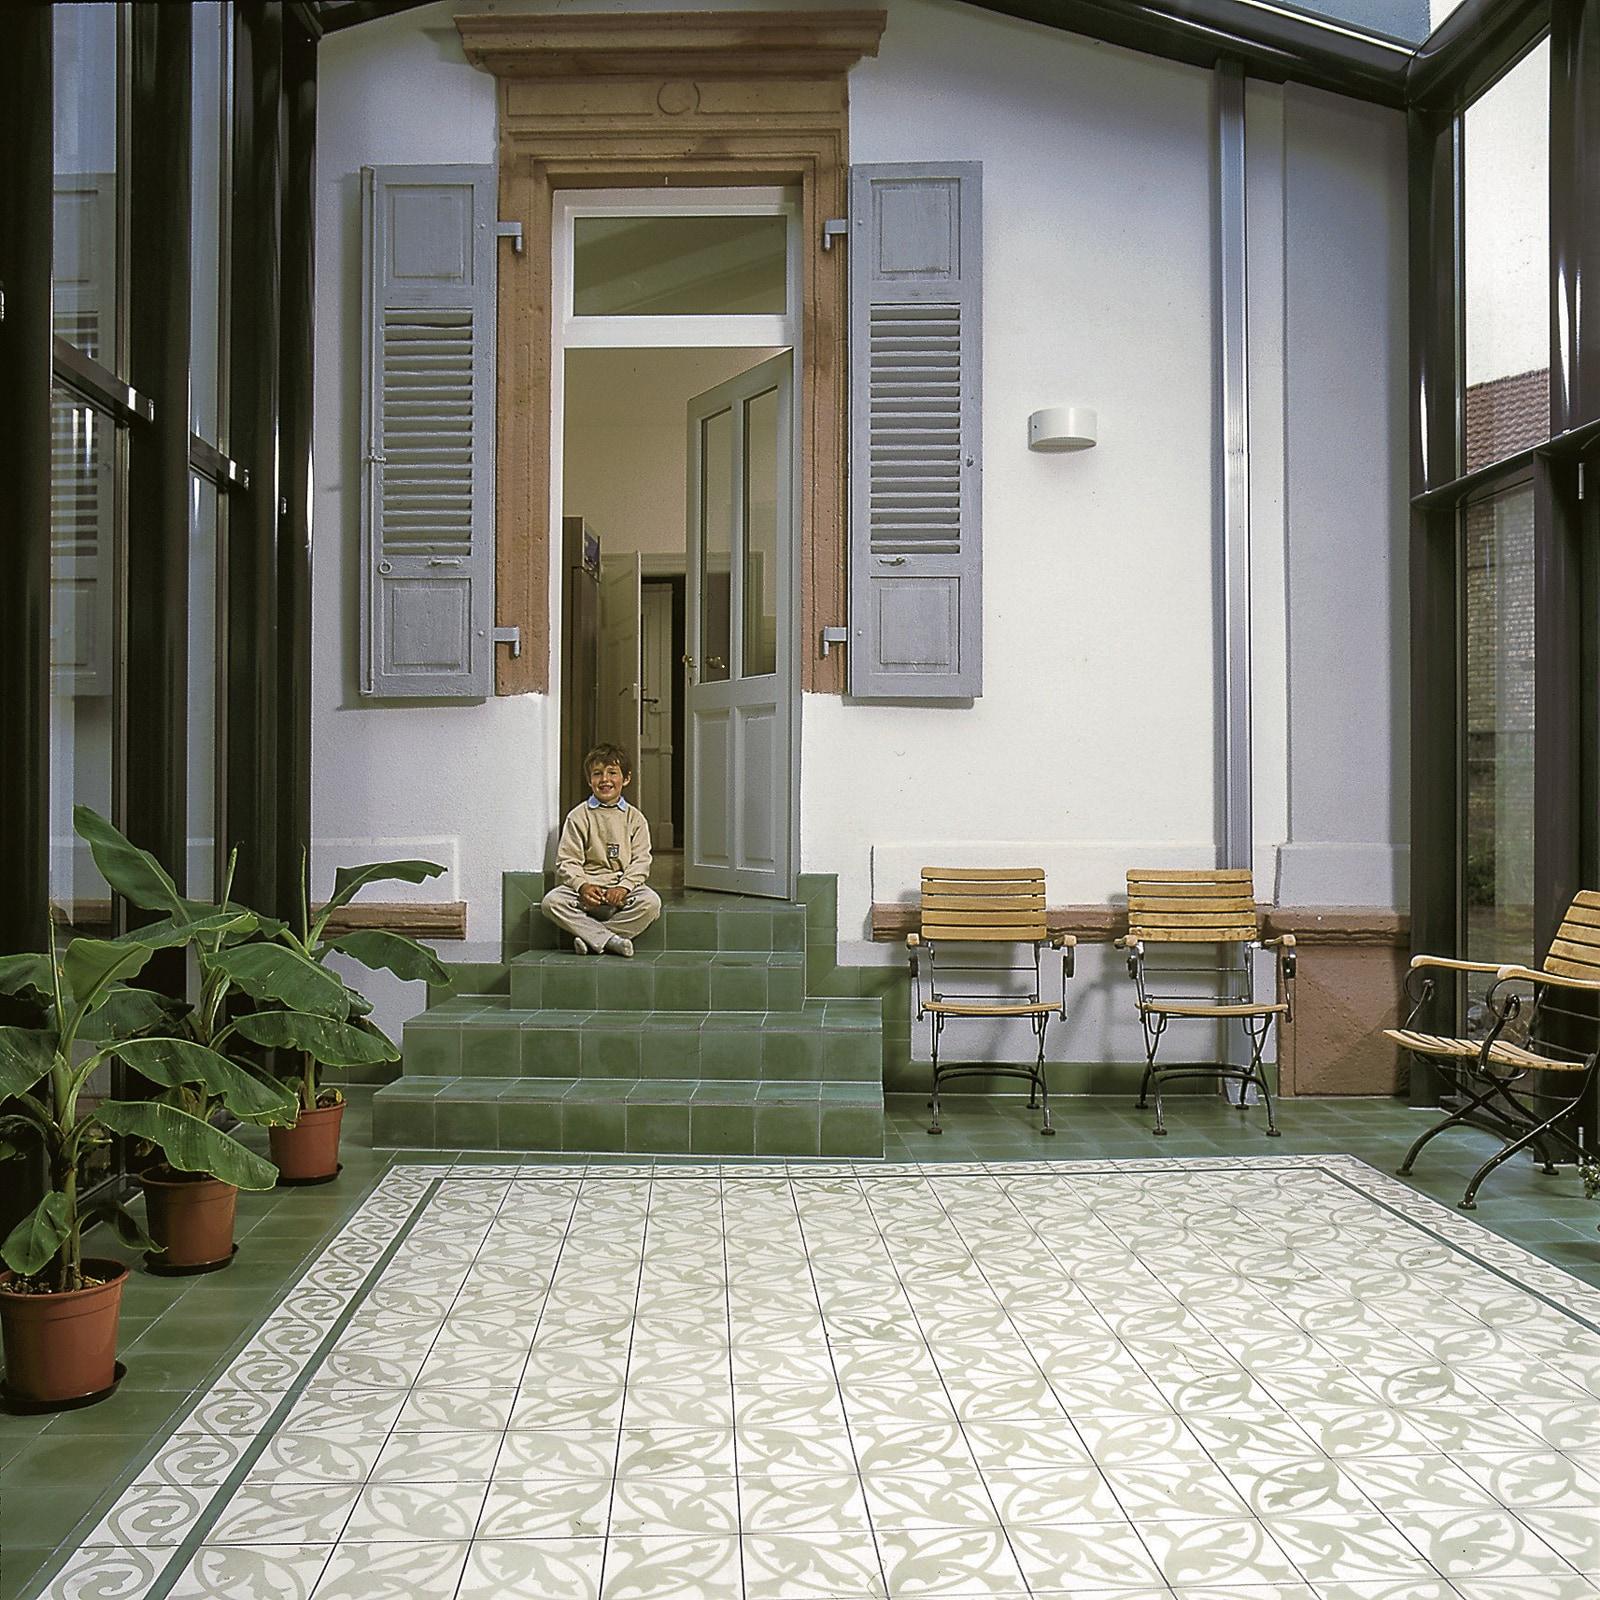 zementmosaikplatte-nummer-10821-wintergarten-02-via-gmbh | 10821